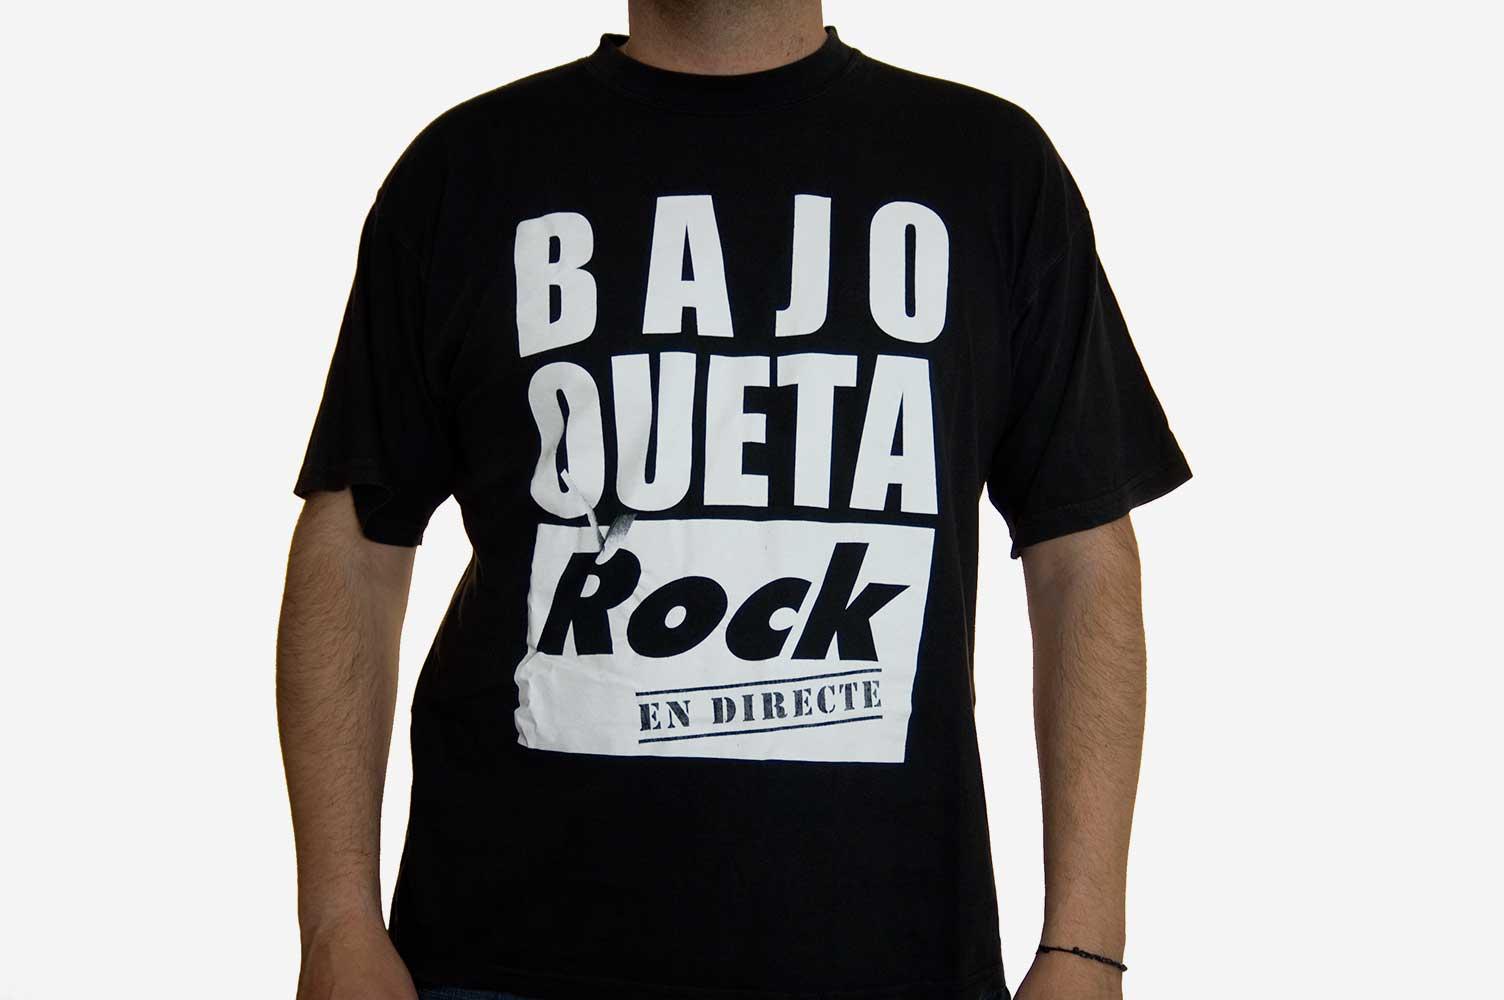 Camiseta Bajoqueta Rock en directeect